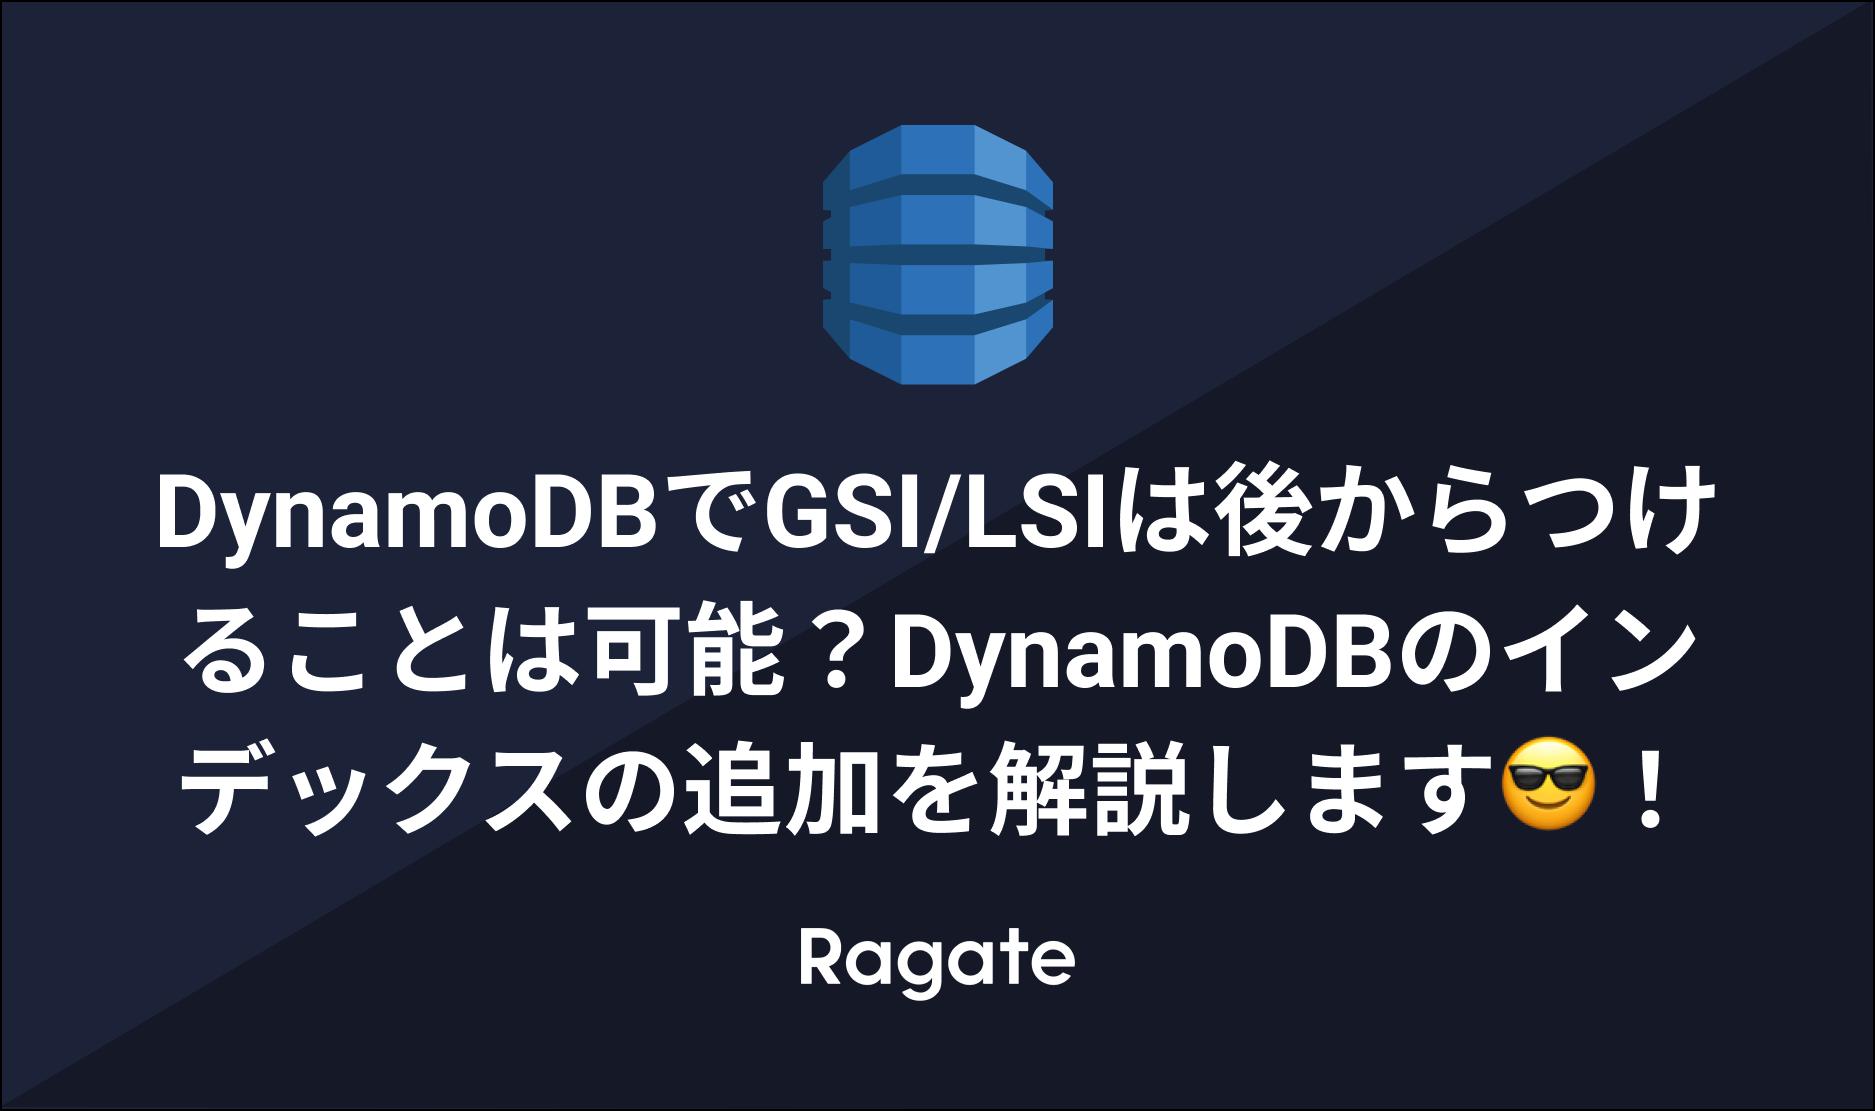 DynamoDB で GSI/LSI は後からつけることは可能?DynamoDB のインデックスの追加を解説します😎!